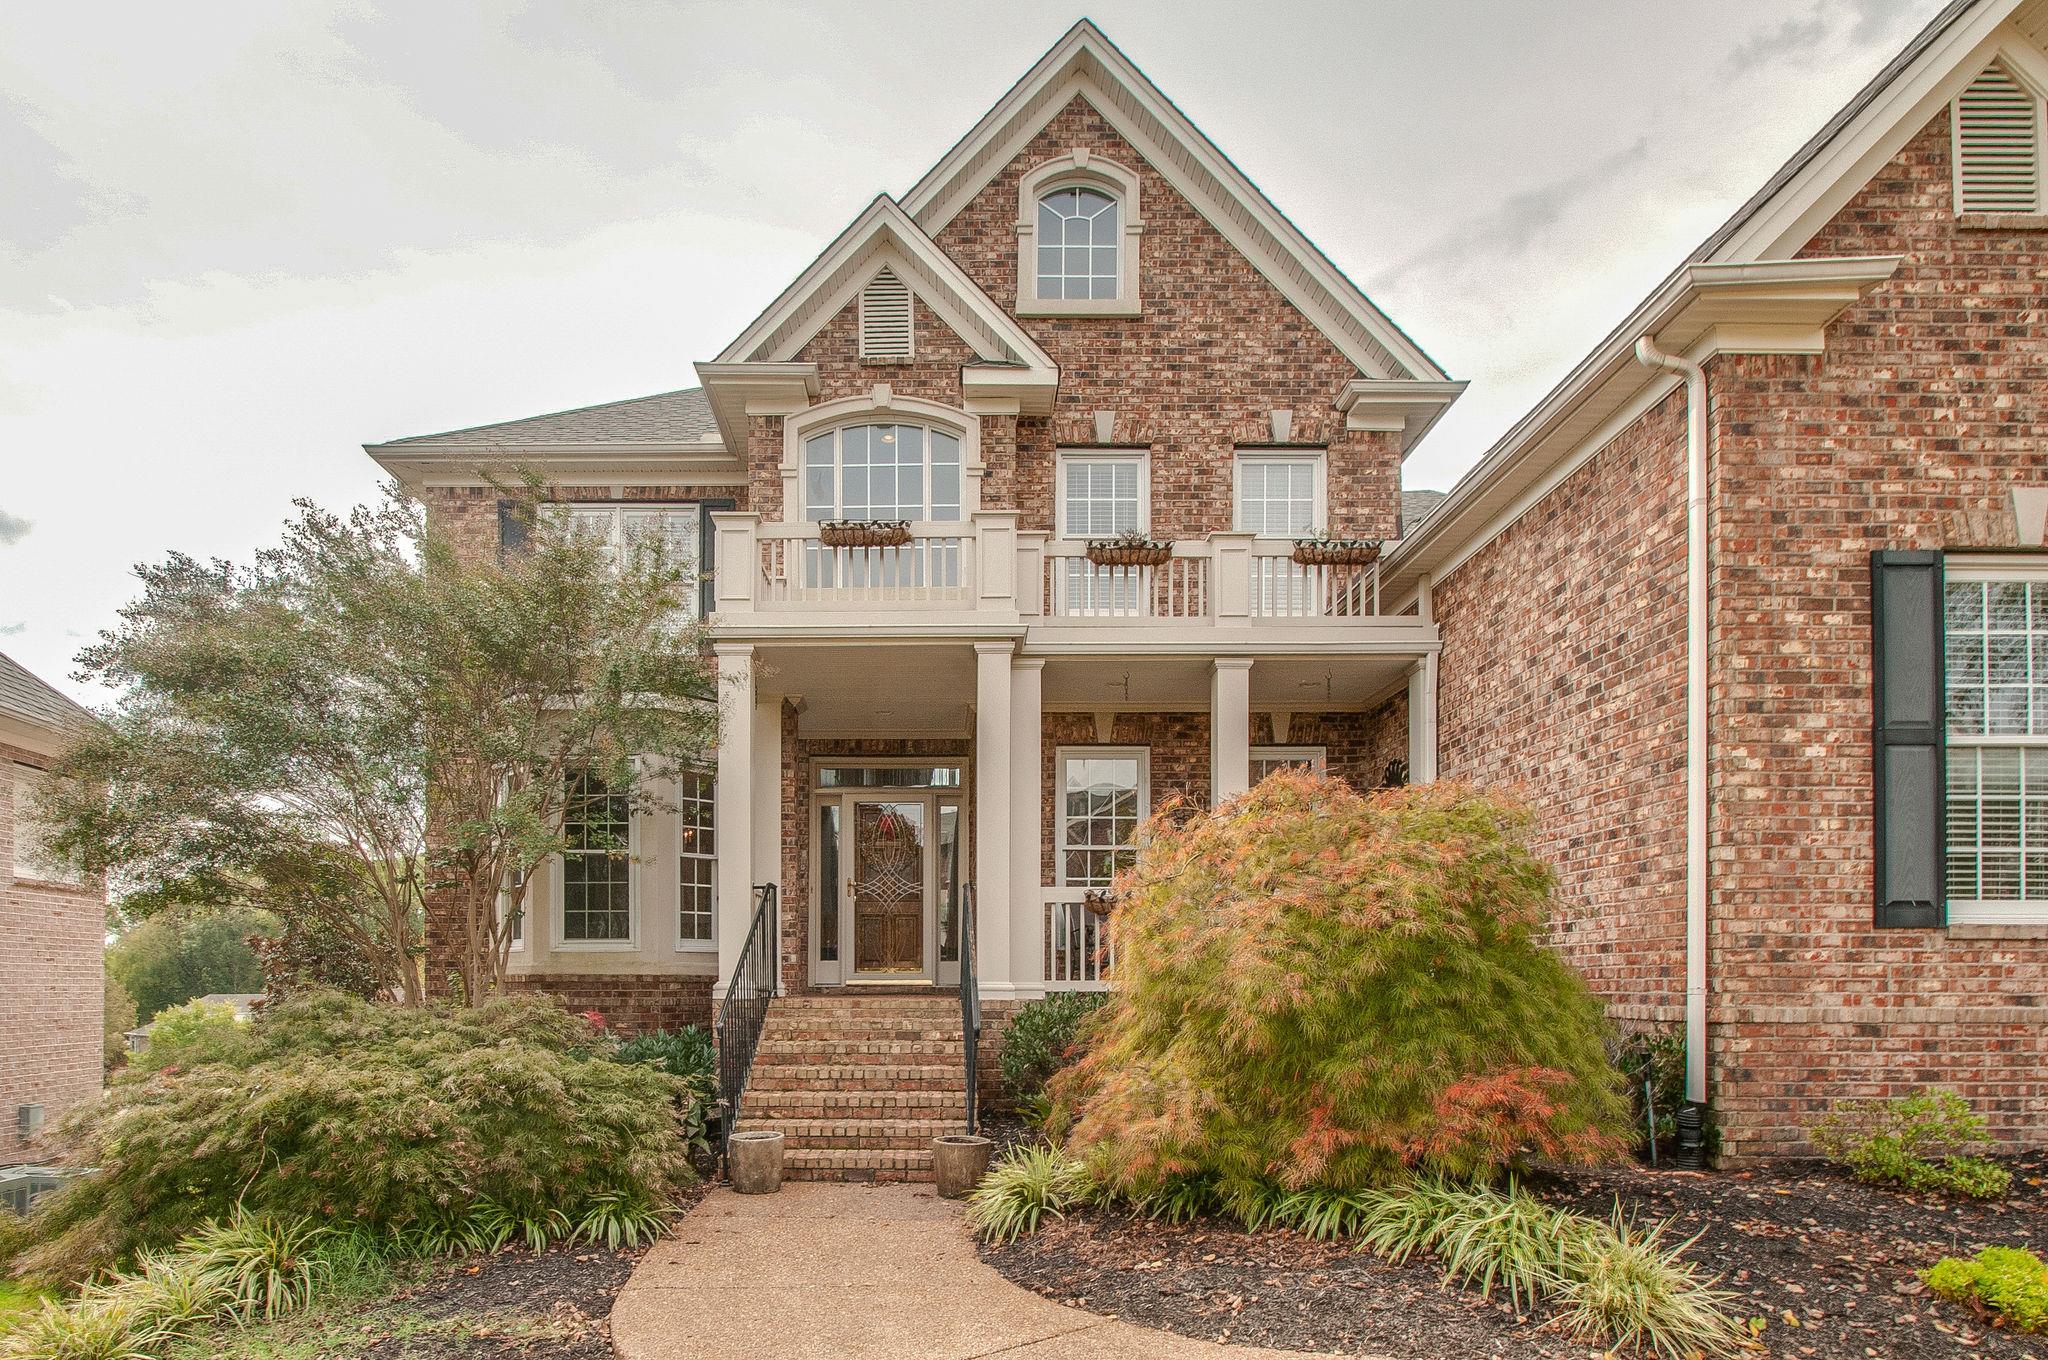 131 12 Stones Xing W, Goodlettsville, TN 37072 - Goodlettsville, TN real estate listing